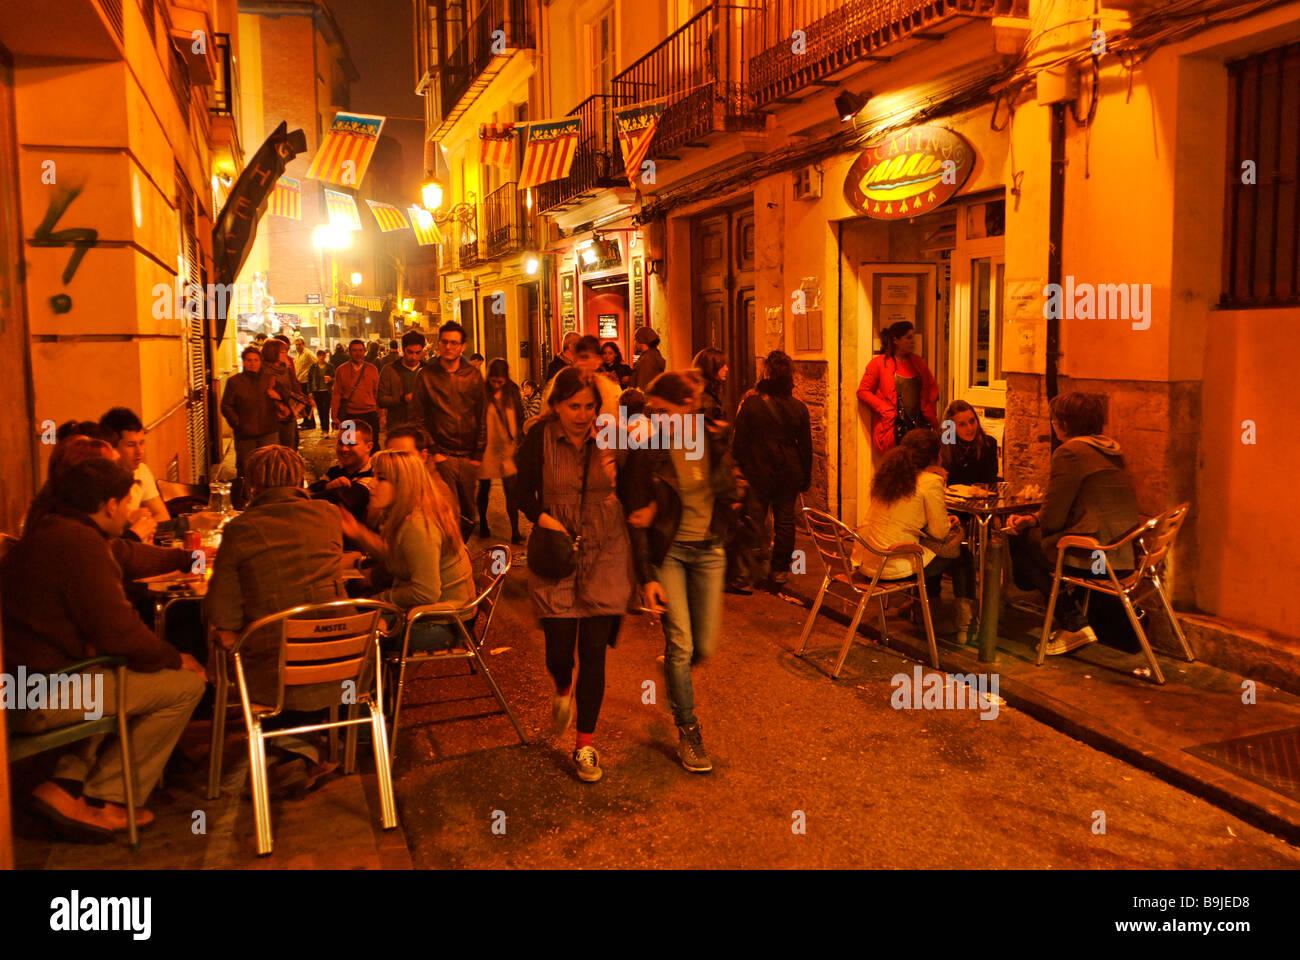 Busy street scene in the old barrio El Carmen during Las Fallas festival historical city centre of Valencia Spain - Stock Image